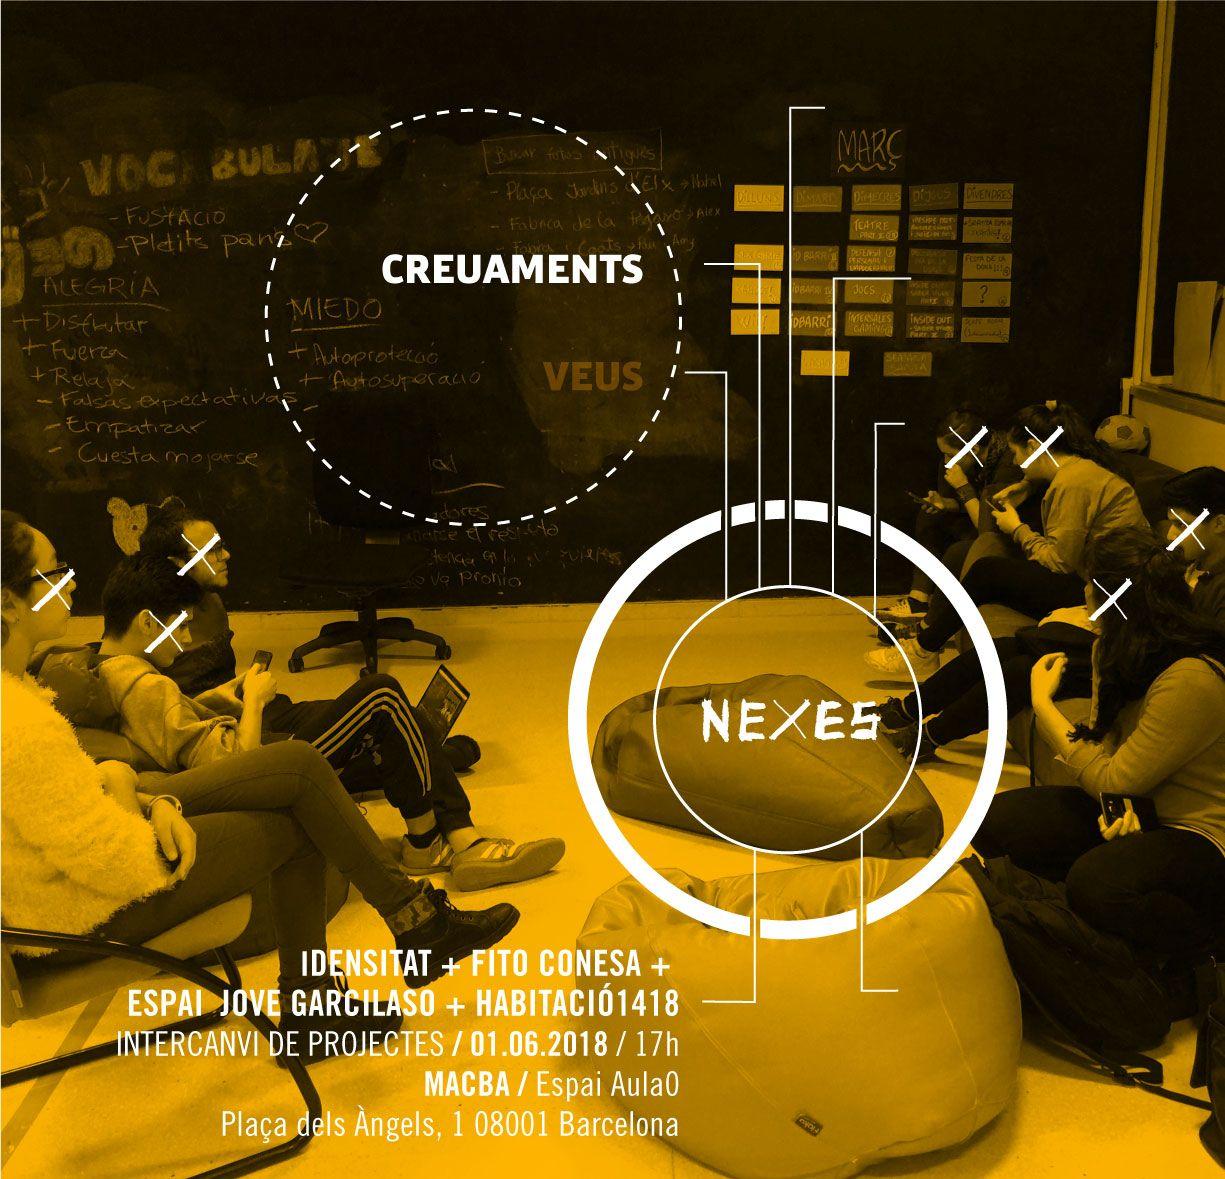 NEXES CREUAMENTS FITO 01